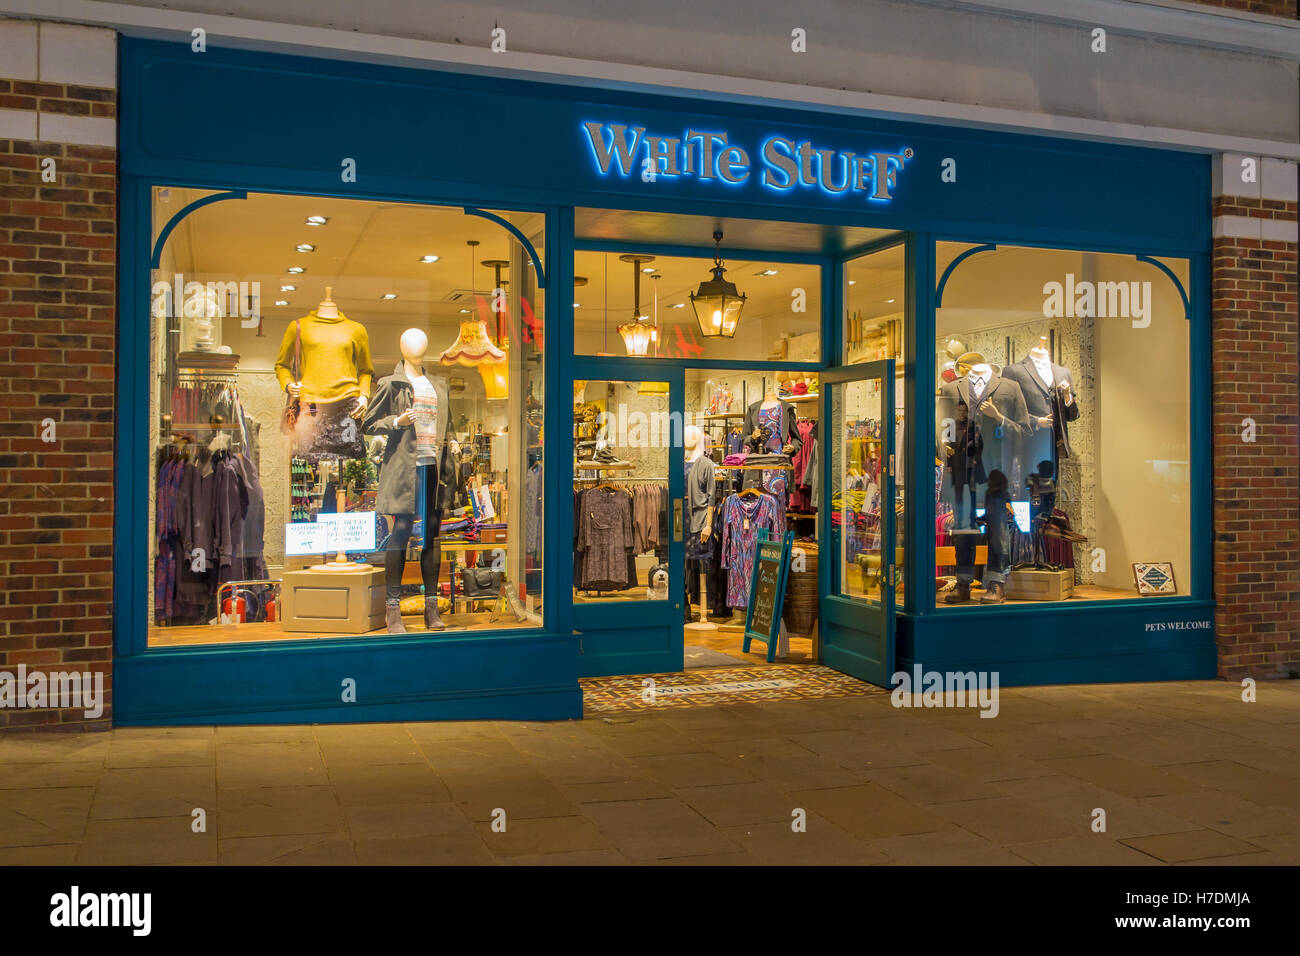 White Stuff Fashion Store Whitefriars Shopping Centre Canterbury Kent UK - Stock Image